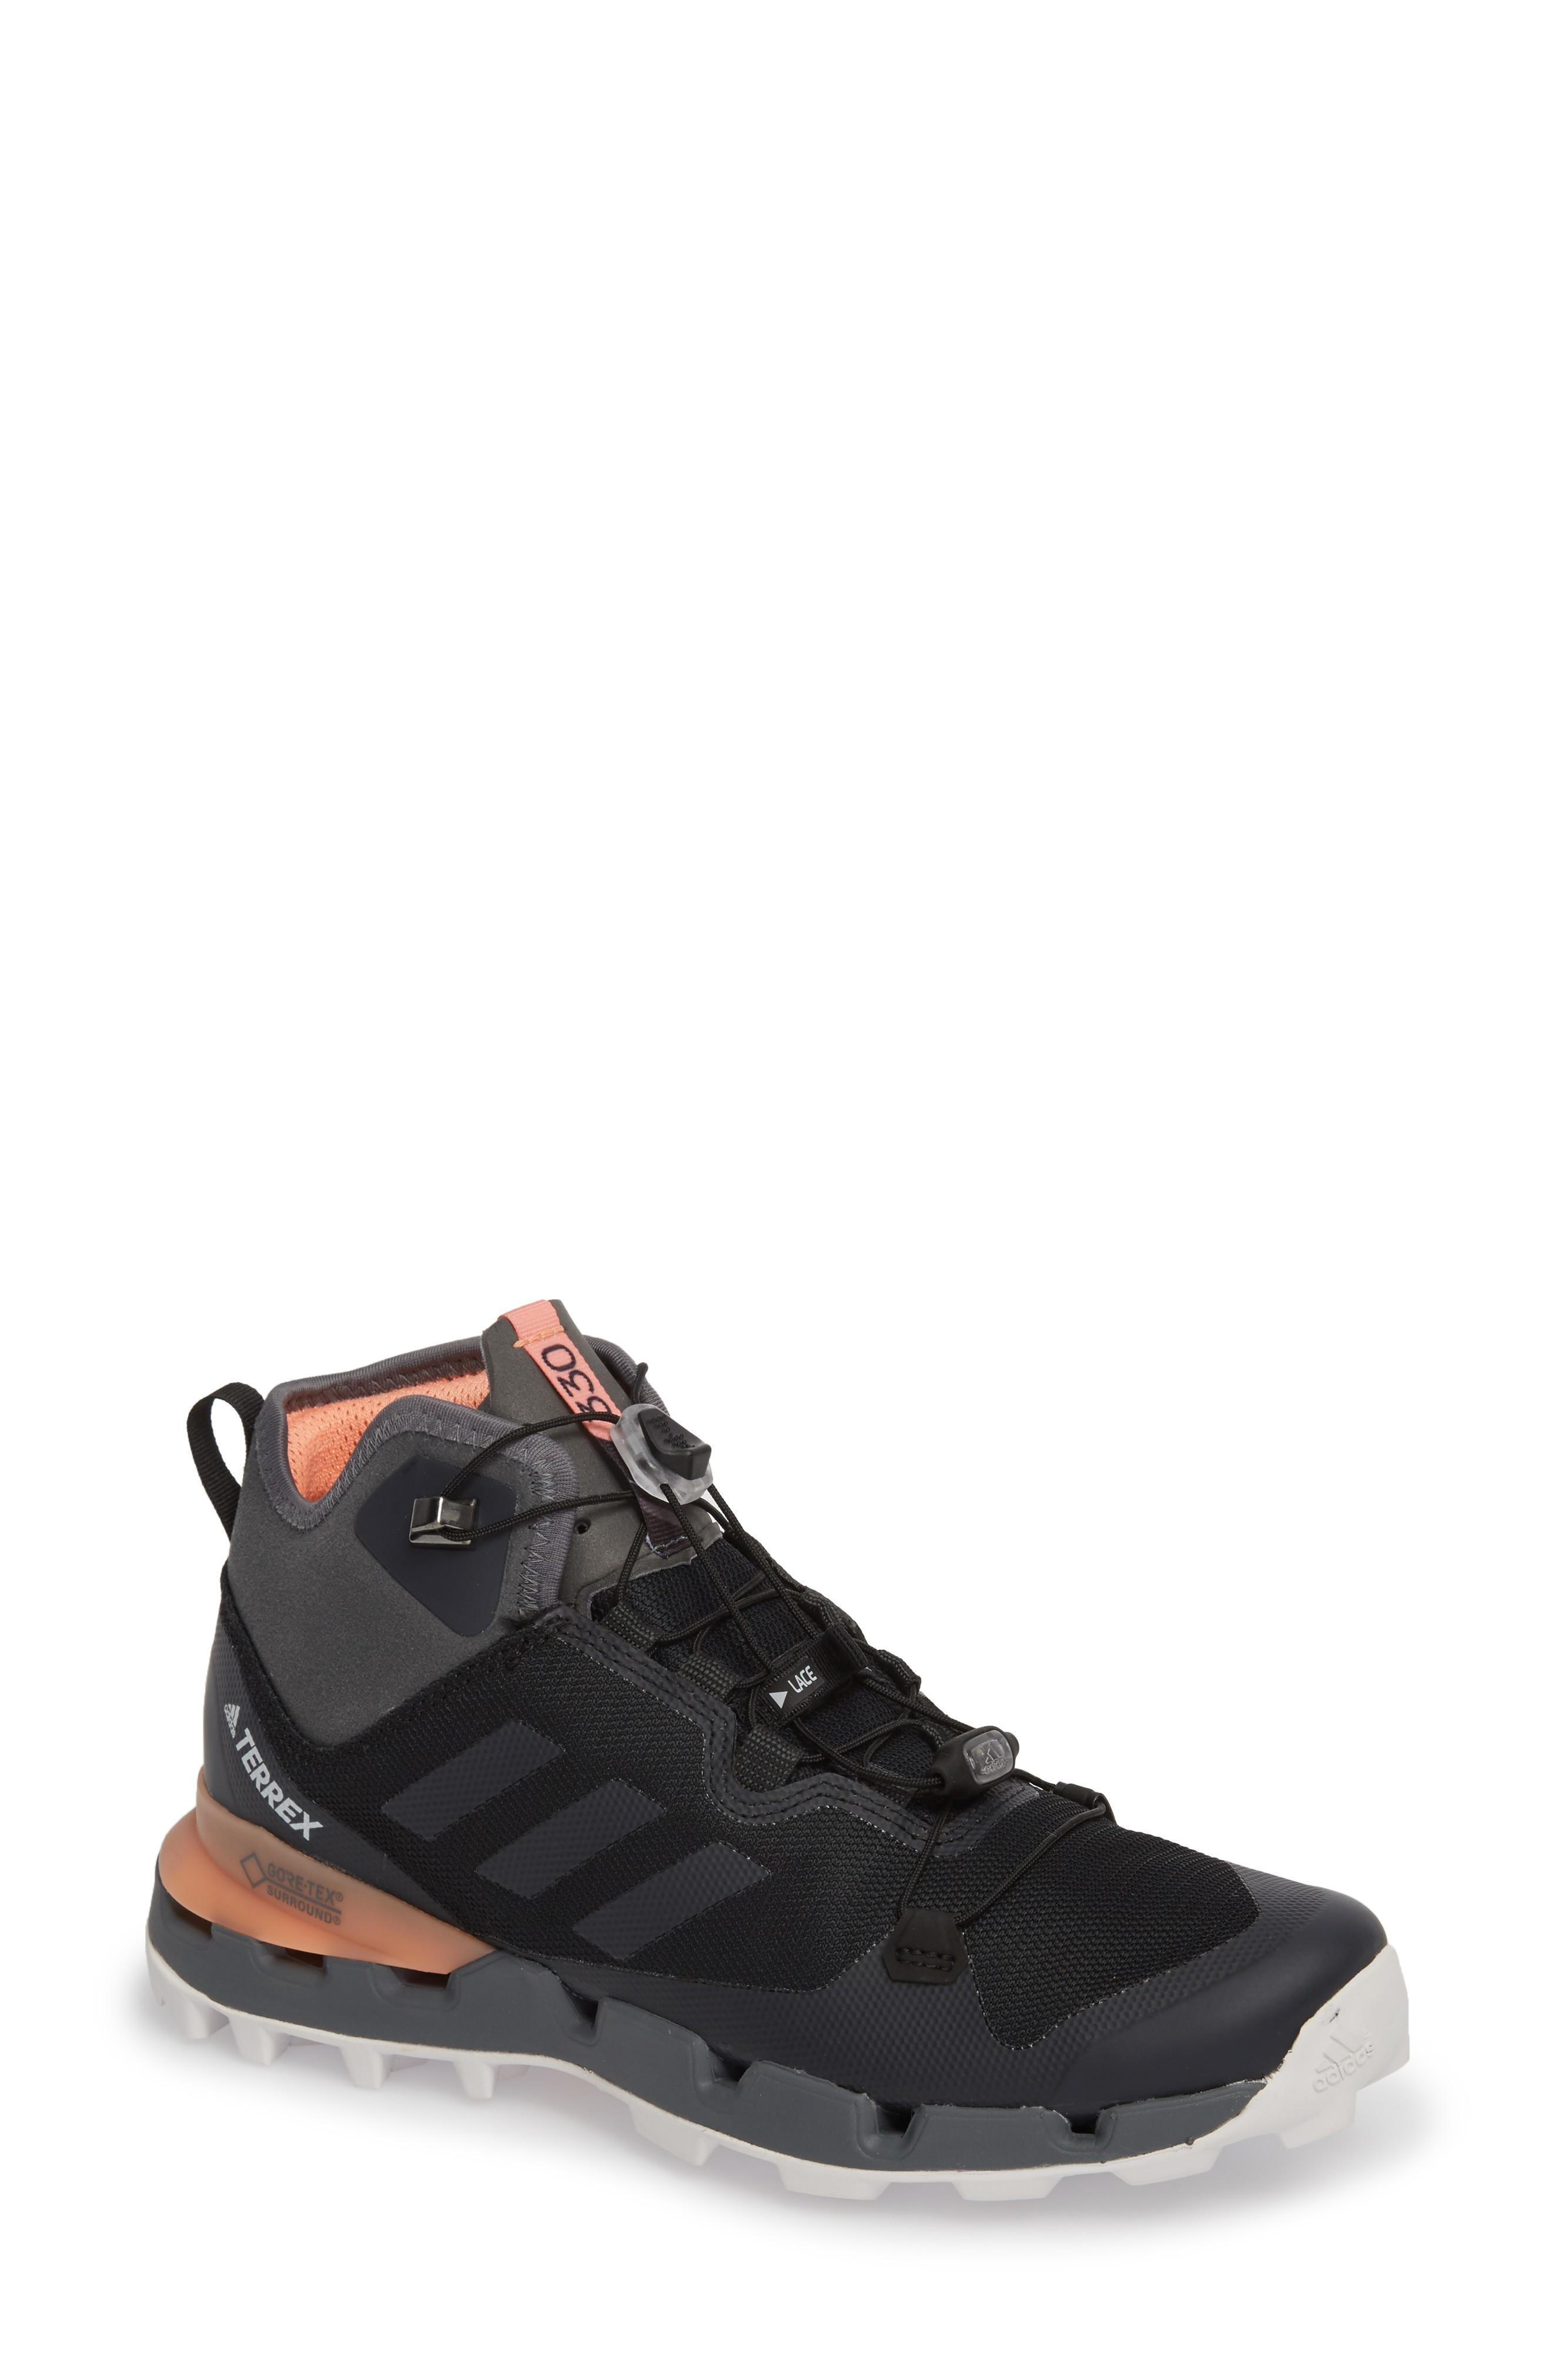 Adidas Originals Terrex Fast Mid Gore-tex In Black/ Grey Five/ Chalk Coral